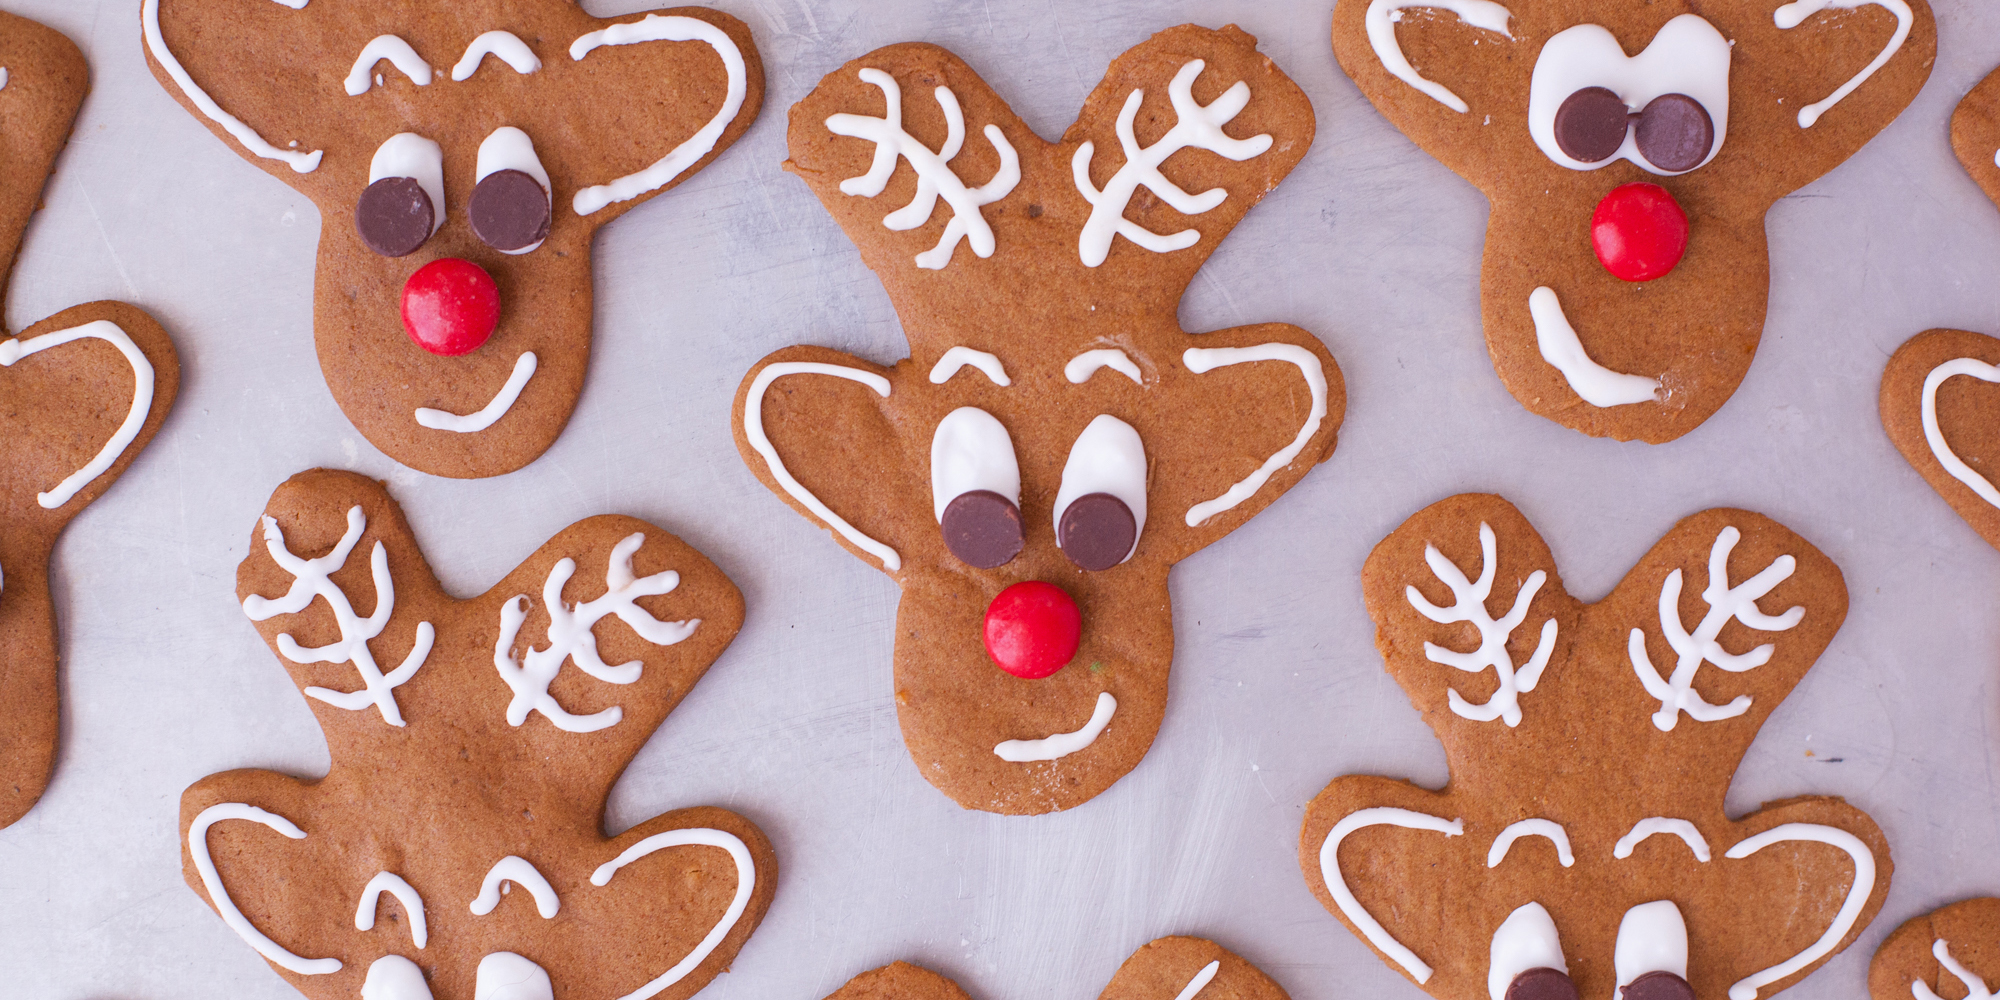 Reindeer Gingerbread Cookies From Gingerbread Men